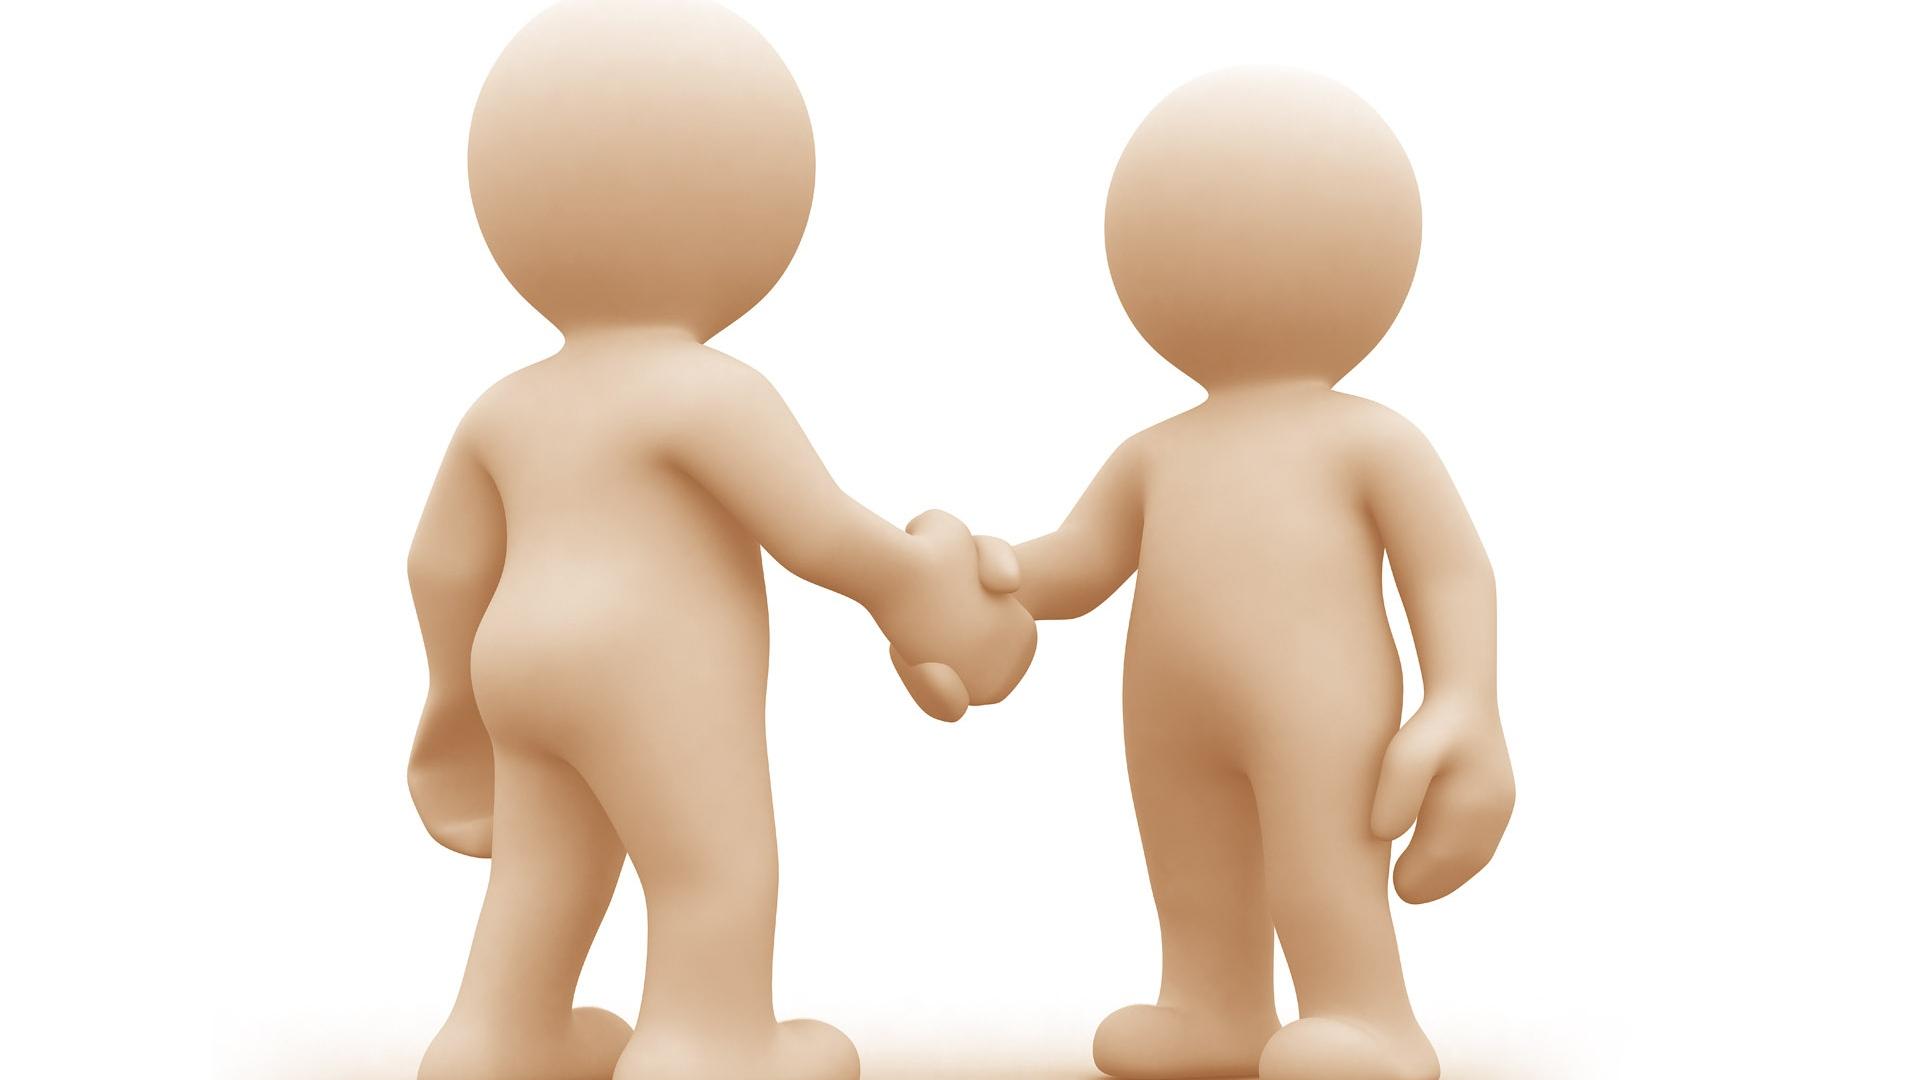 Friendship clipart person. Download wallpaper handshake people